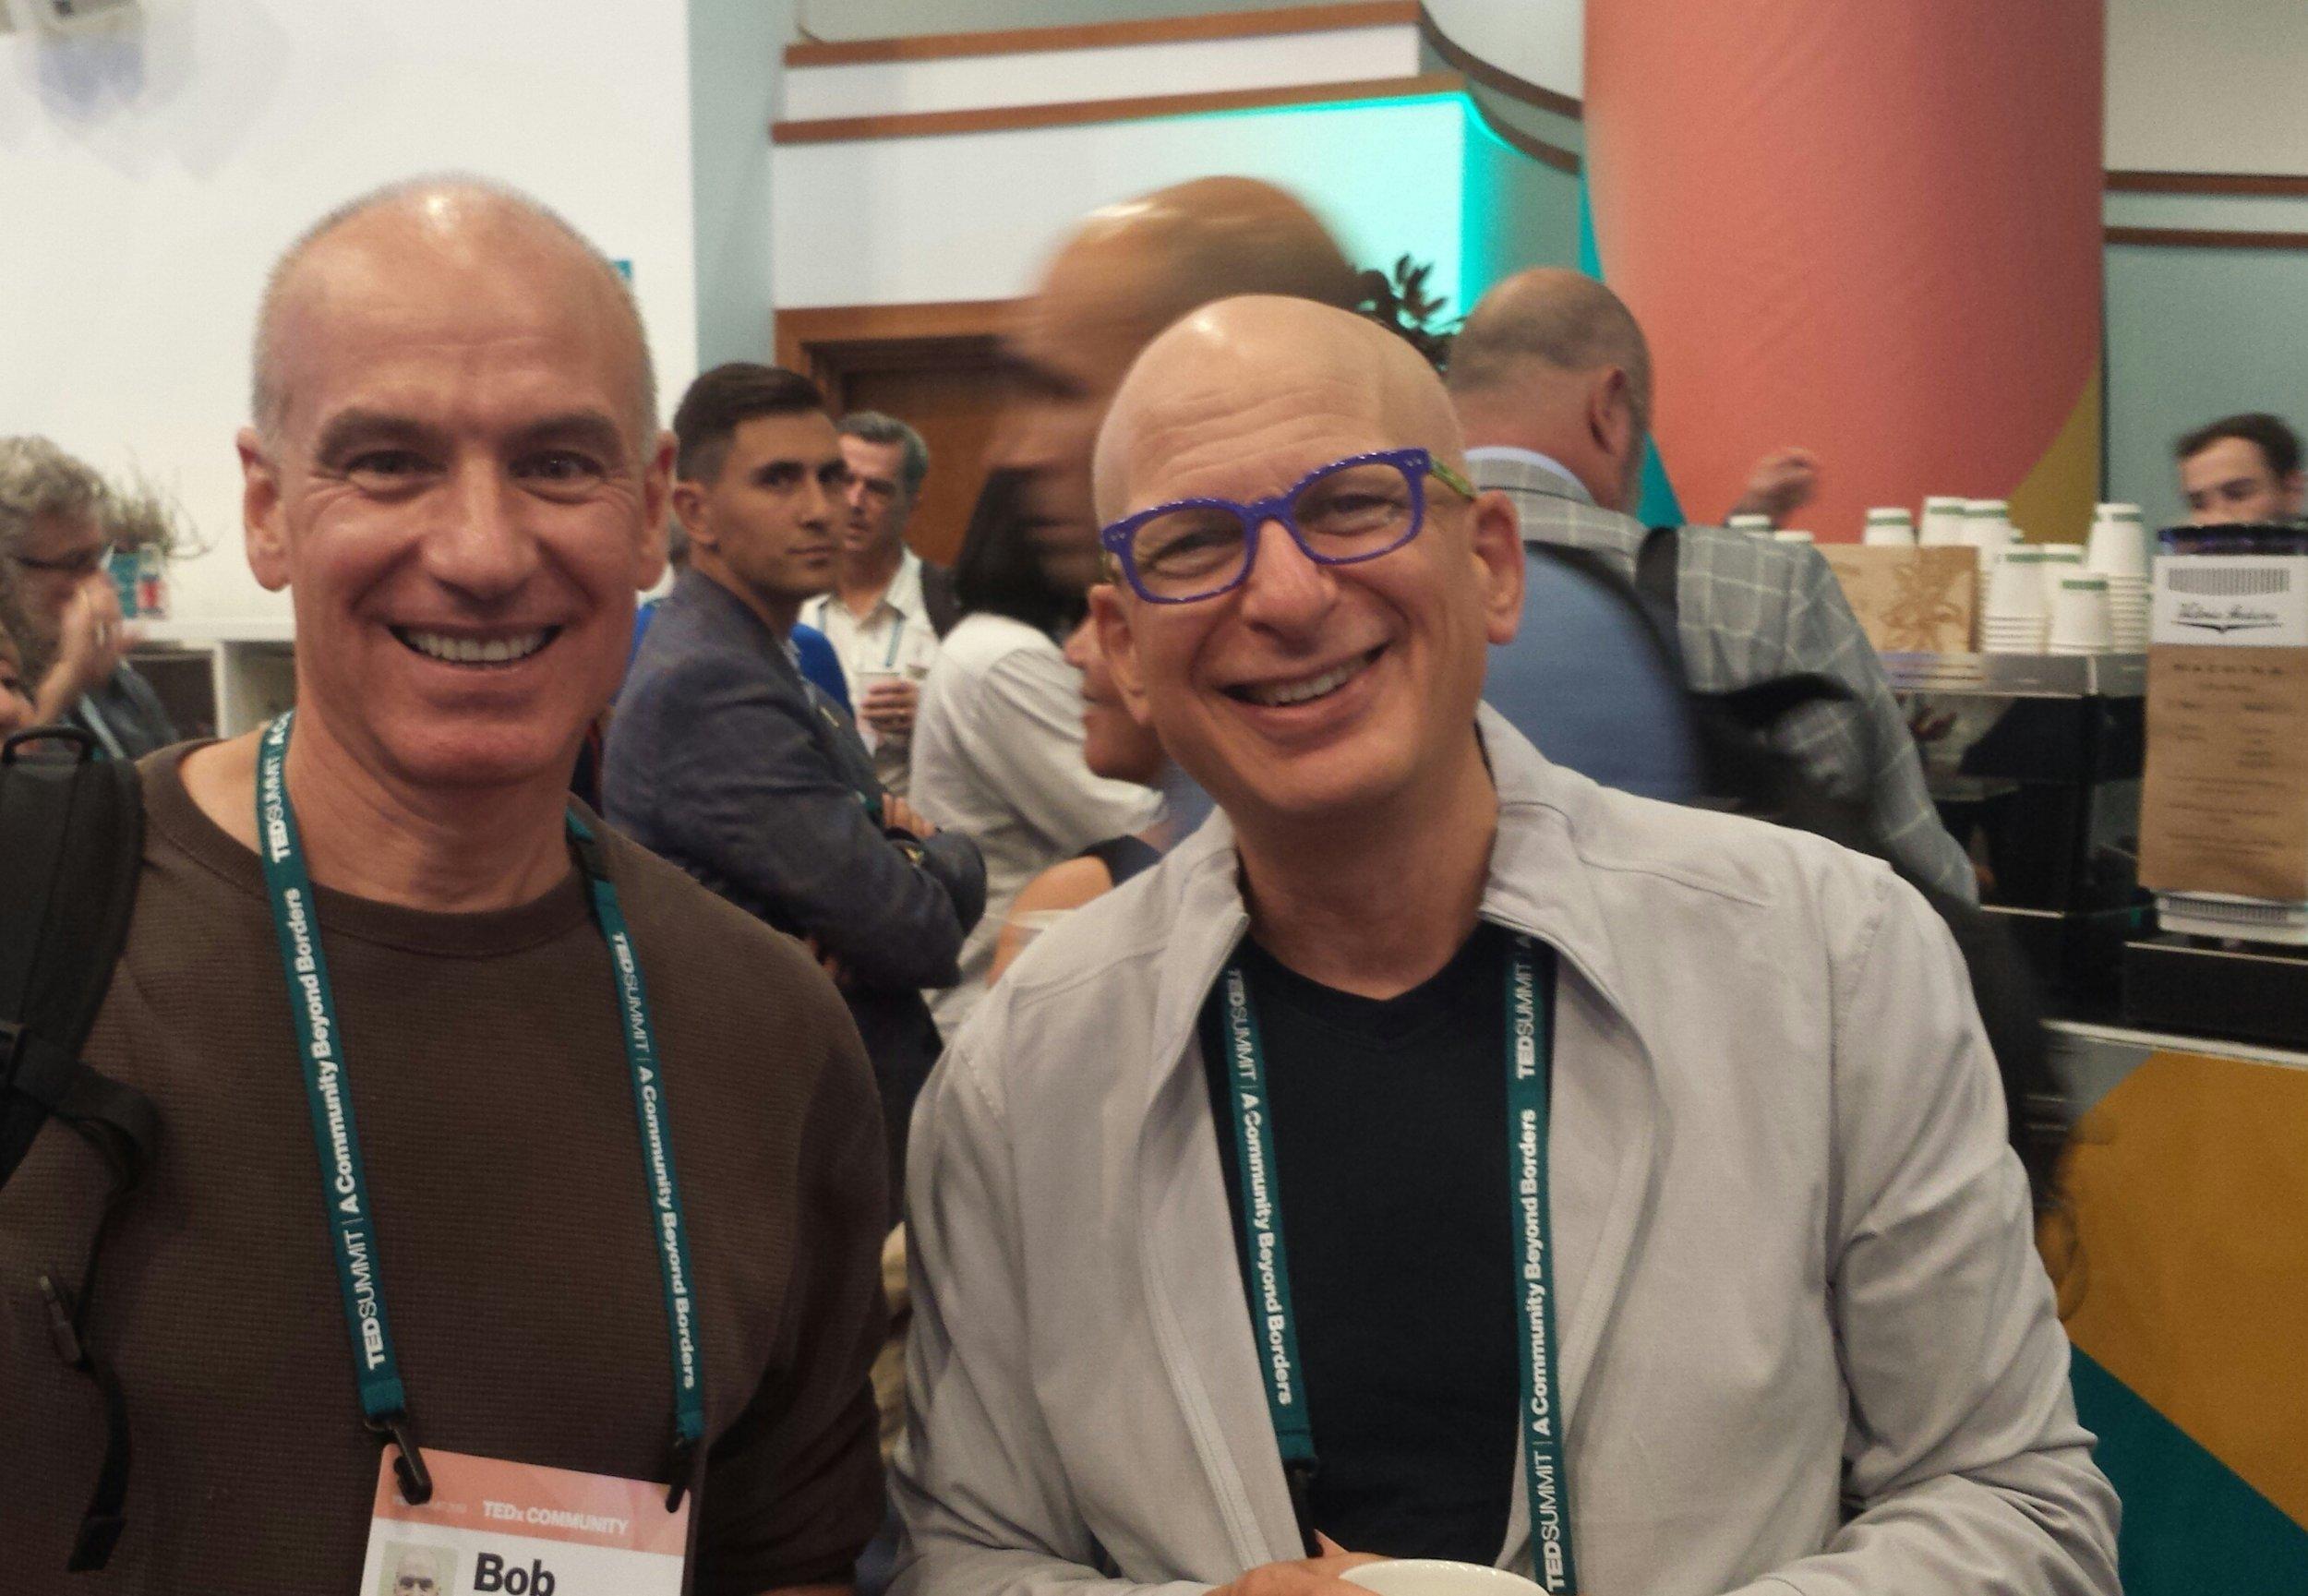 Bob Vasile with Seth Godin at TEDSummit 2019 in Edinburgh, Scotland